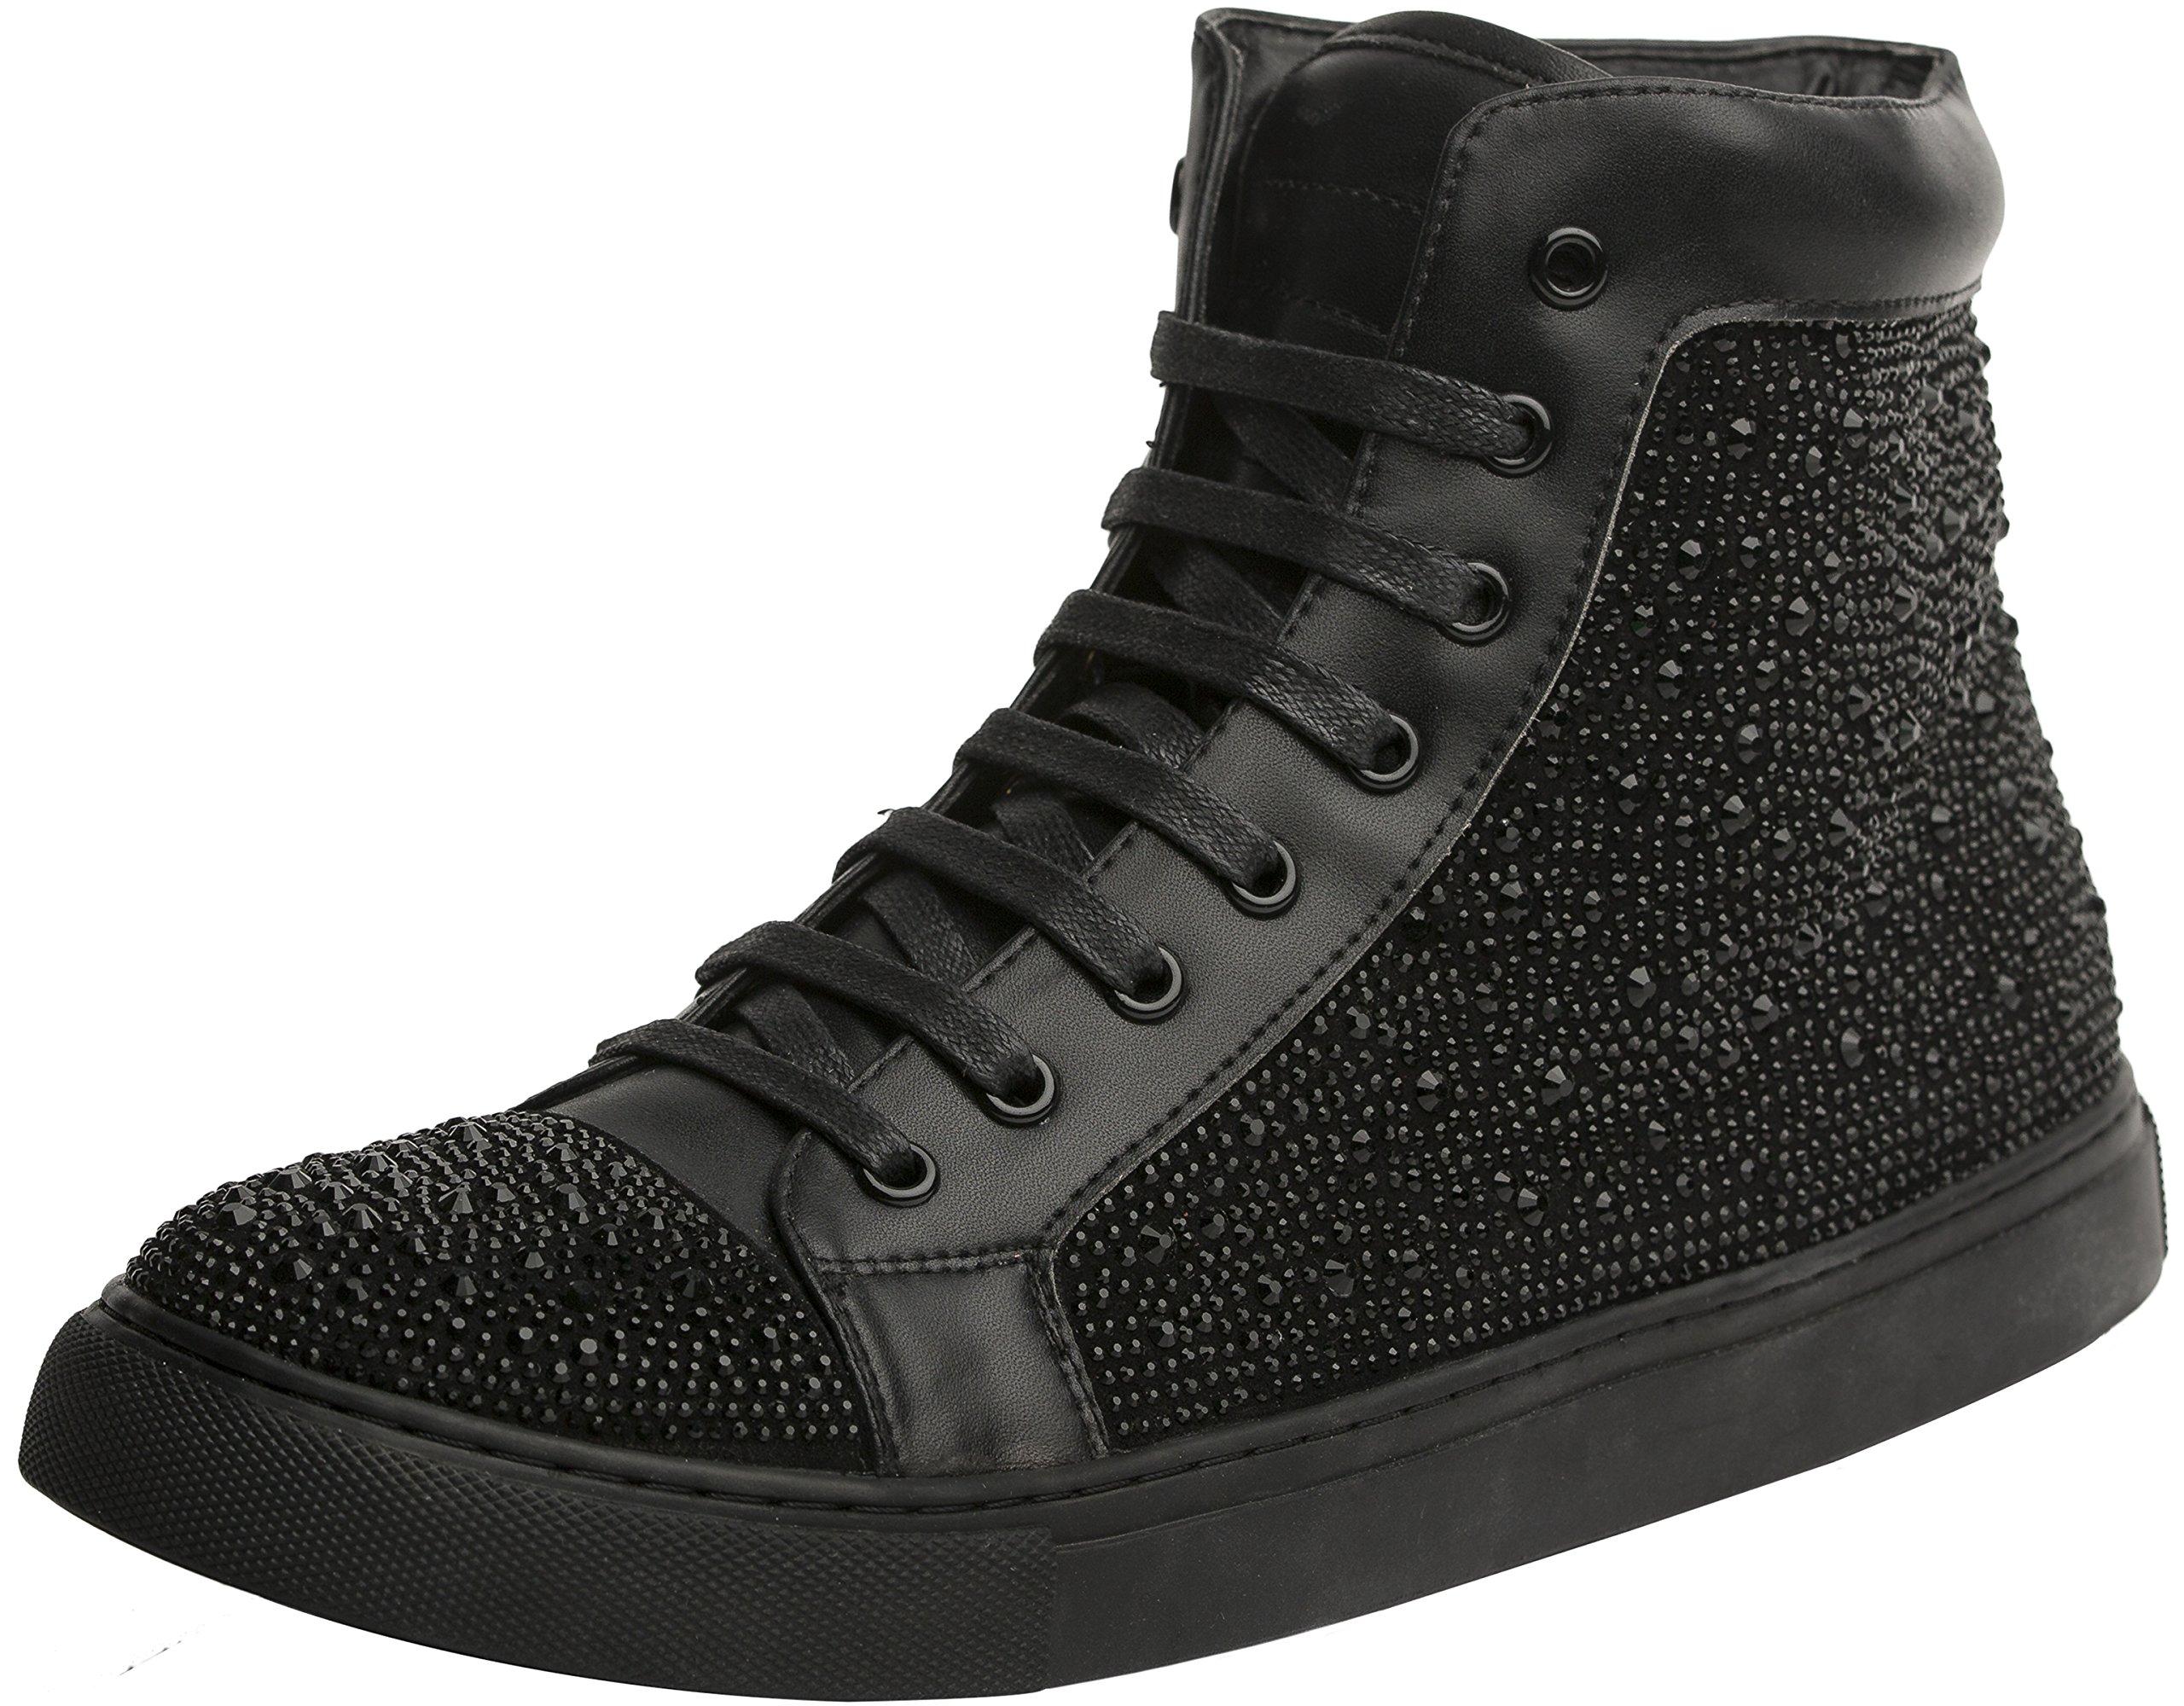 J75 by Jump Men's Zoltar High-Top Fashion Sneaker Black 10 D US